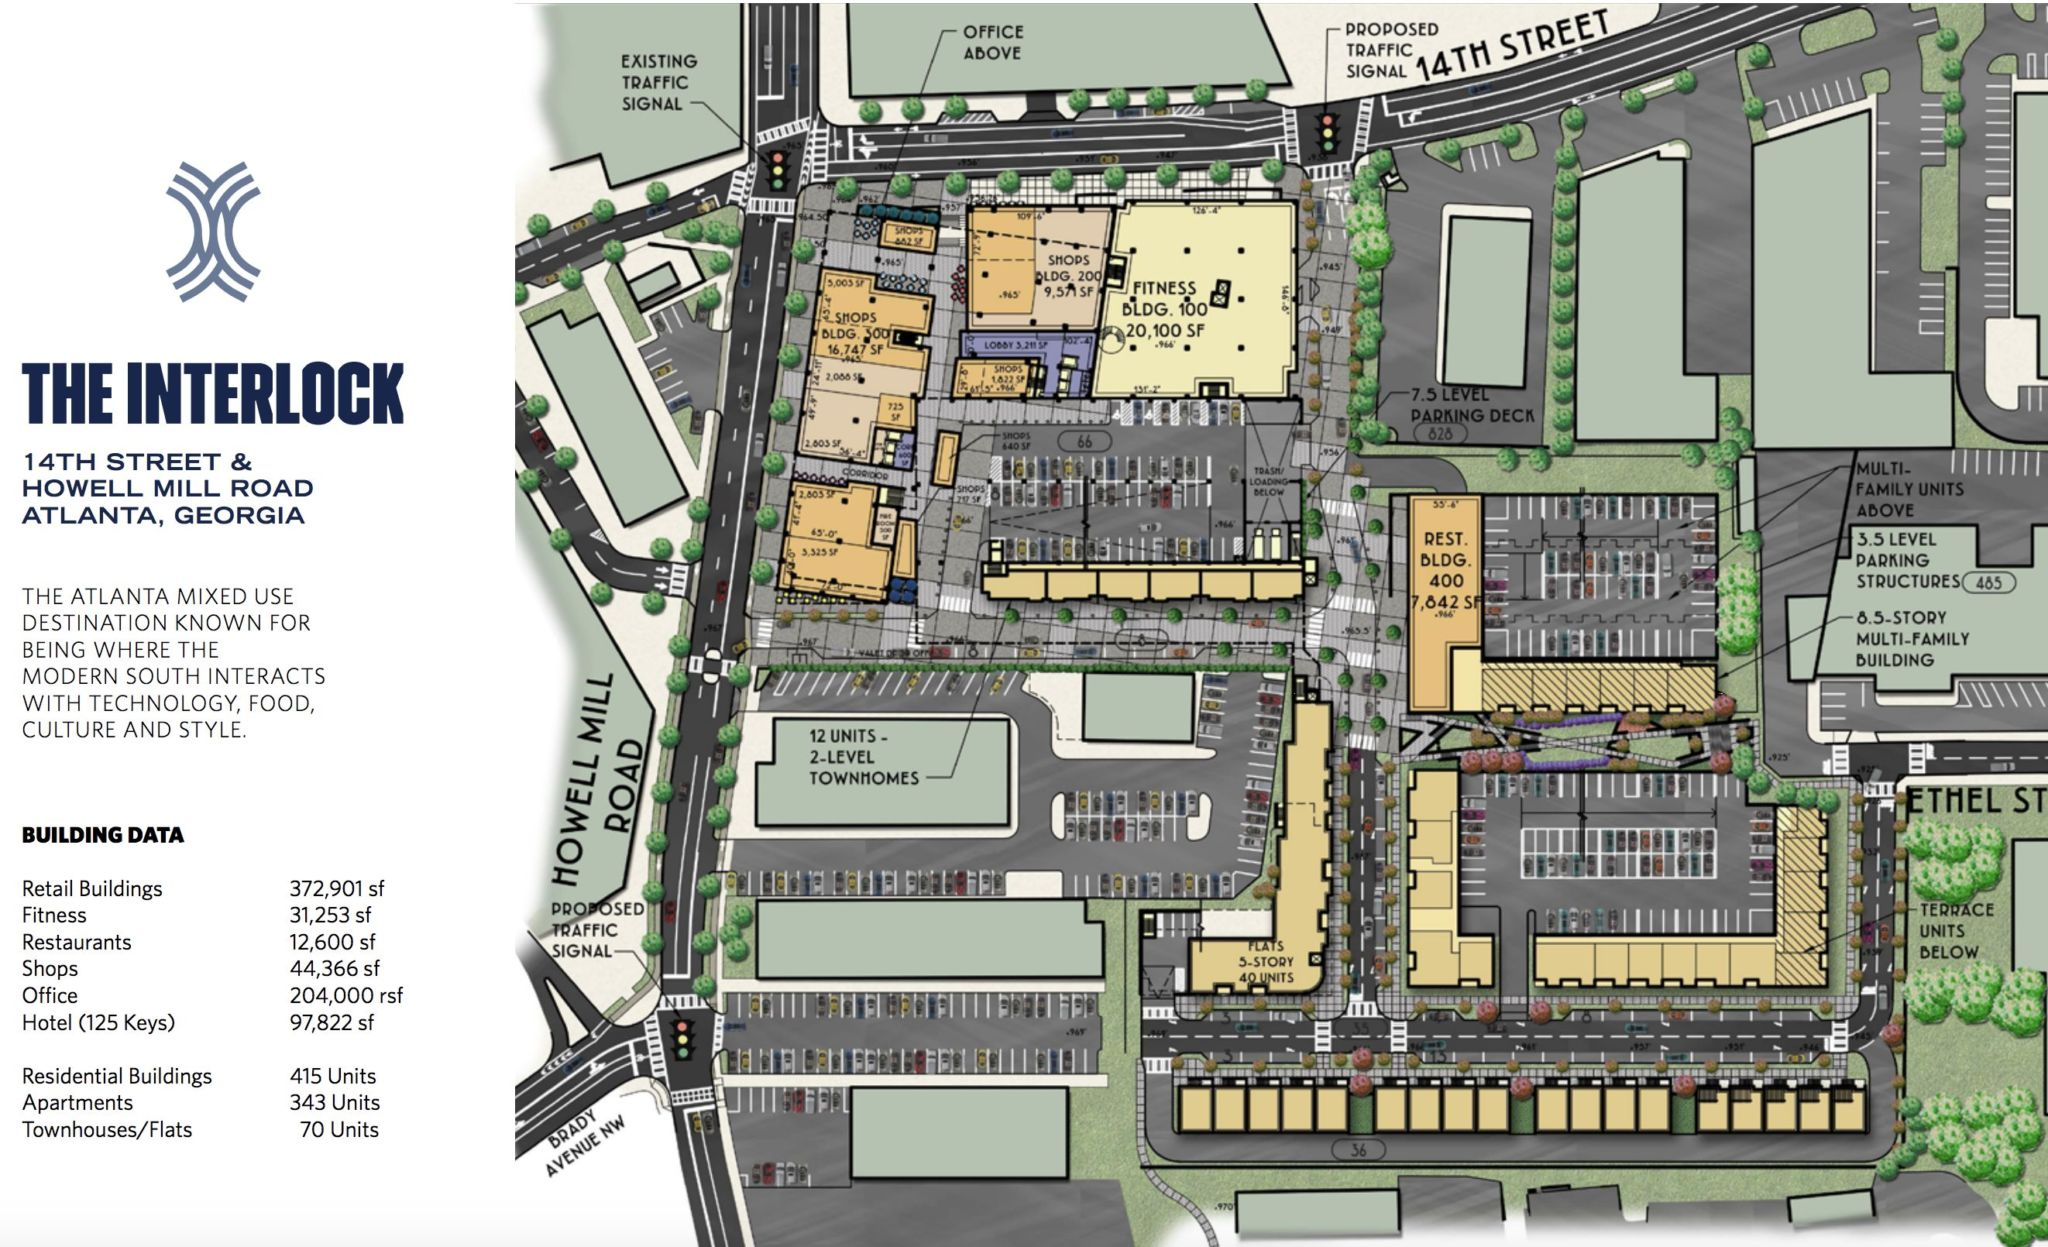 The Interlock Site Plan